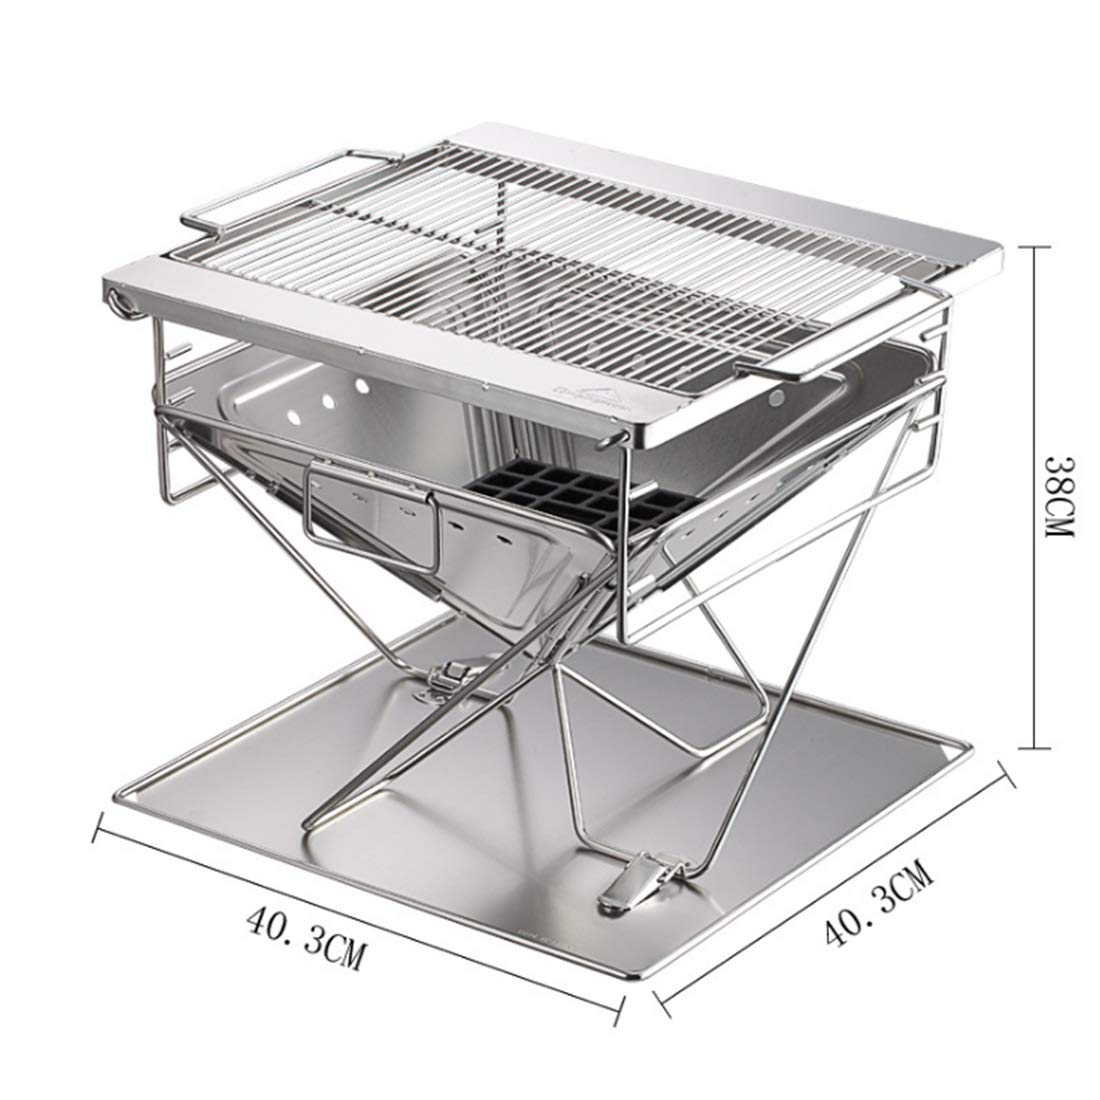 WEATLY Rostfreier Stahl-faltender Grill-Grill-Grill BBQ-Ofen